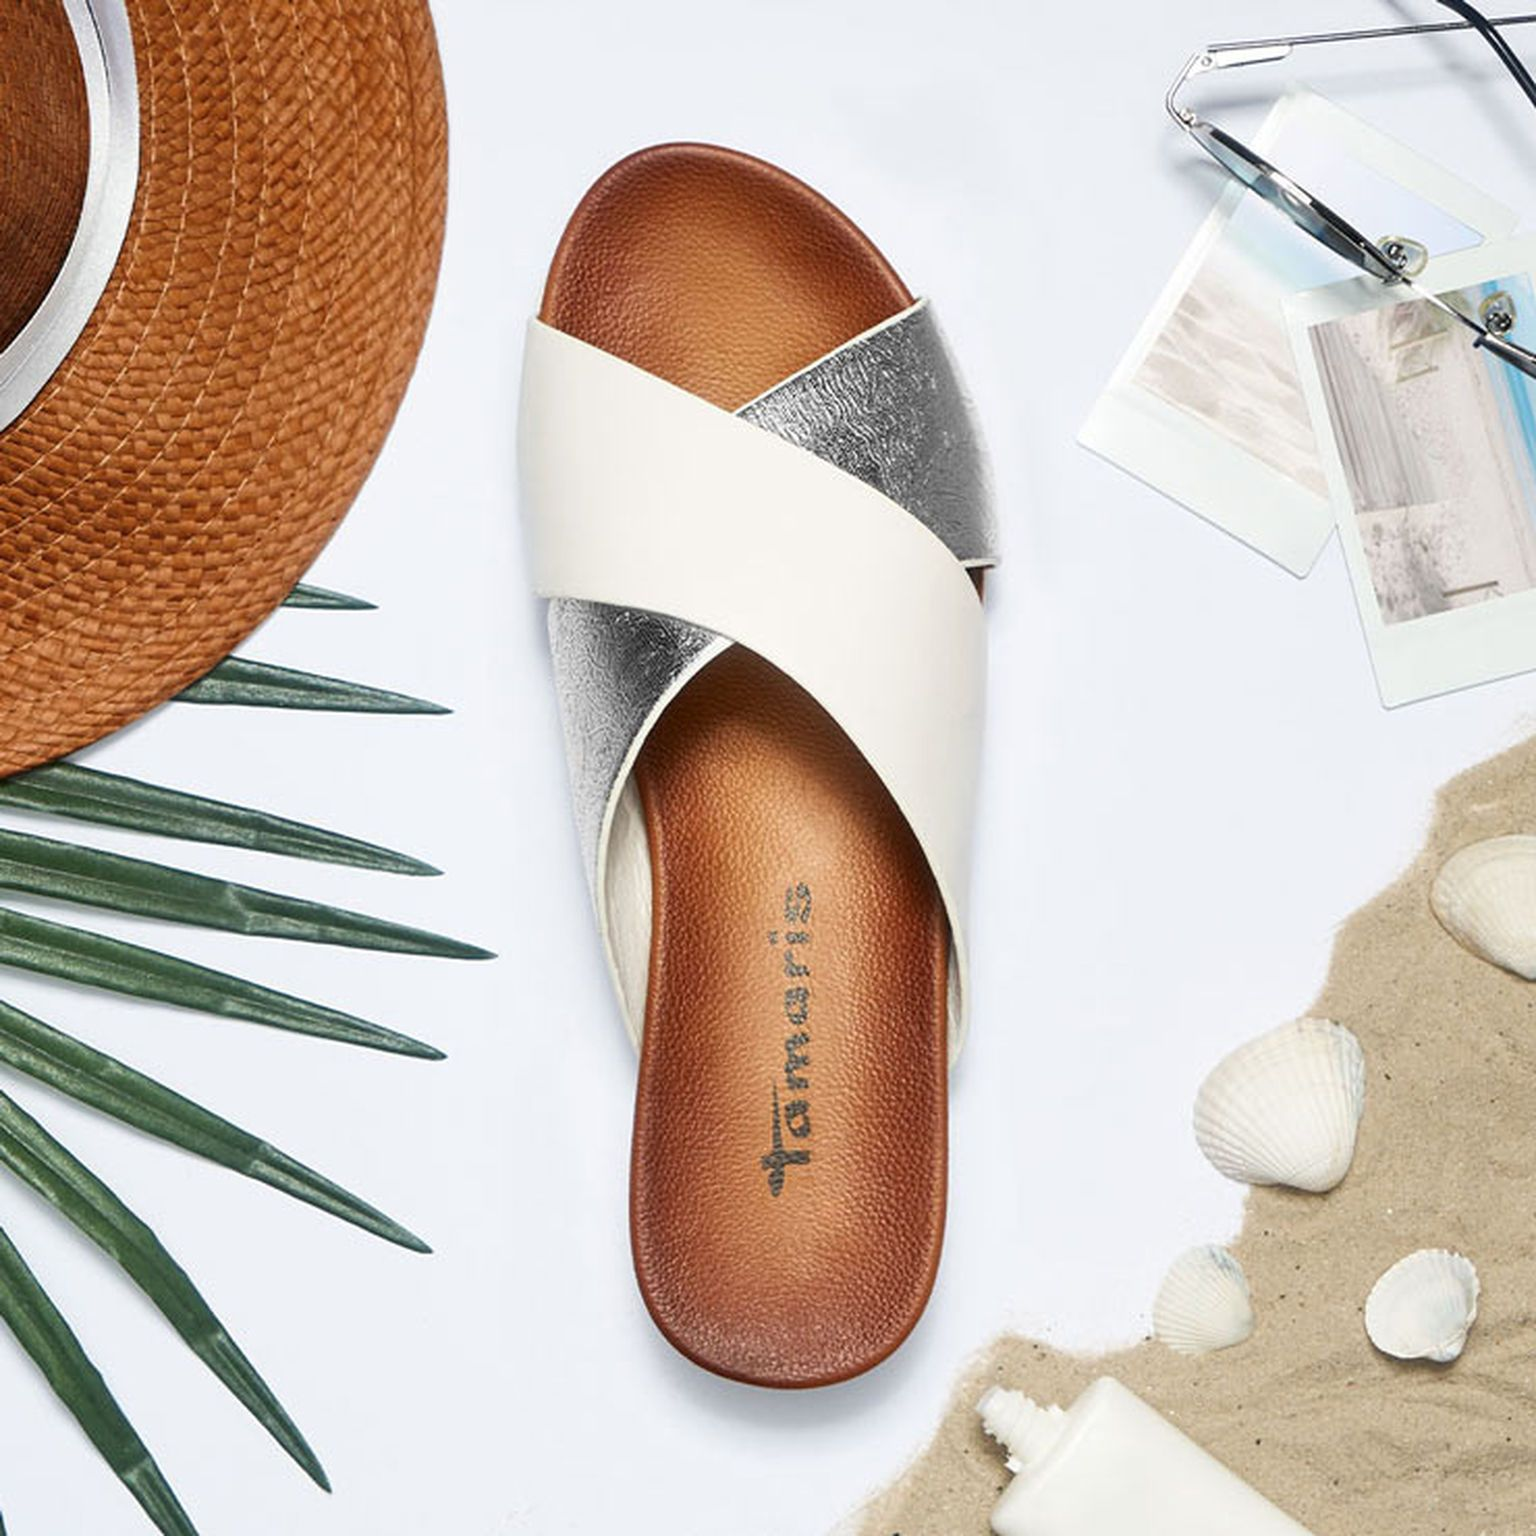 Tamaris online shop – Women s shoes – Women s handbags – Jewellery ... 5c5672e5628